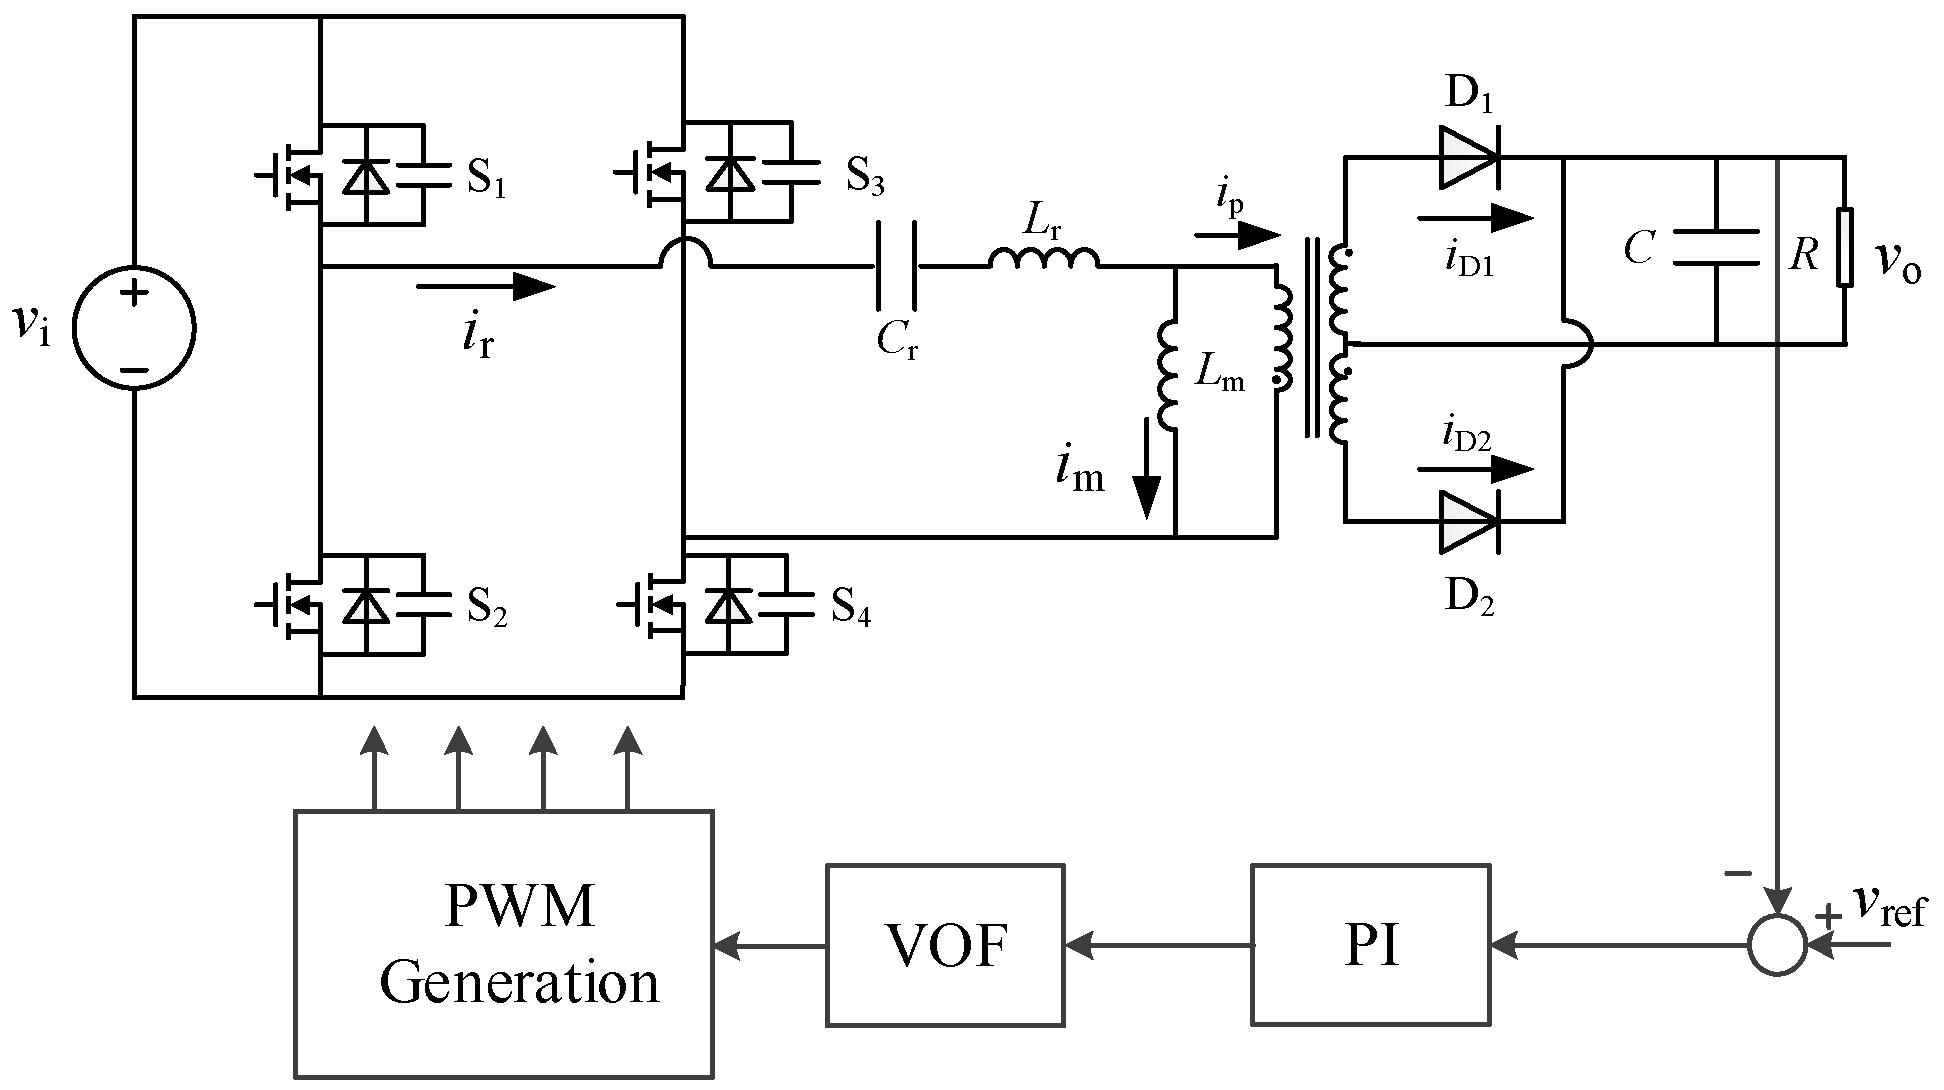 1000v motor wiring diagram